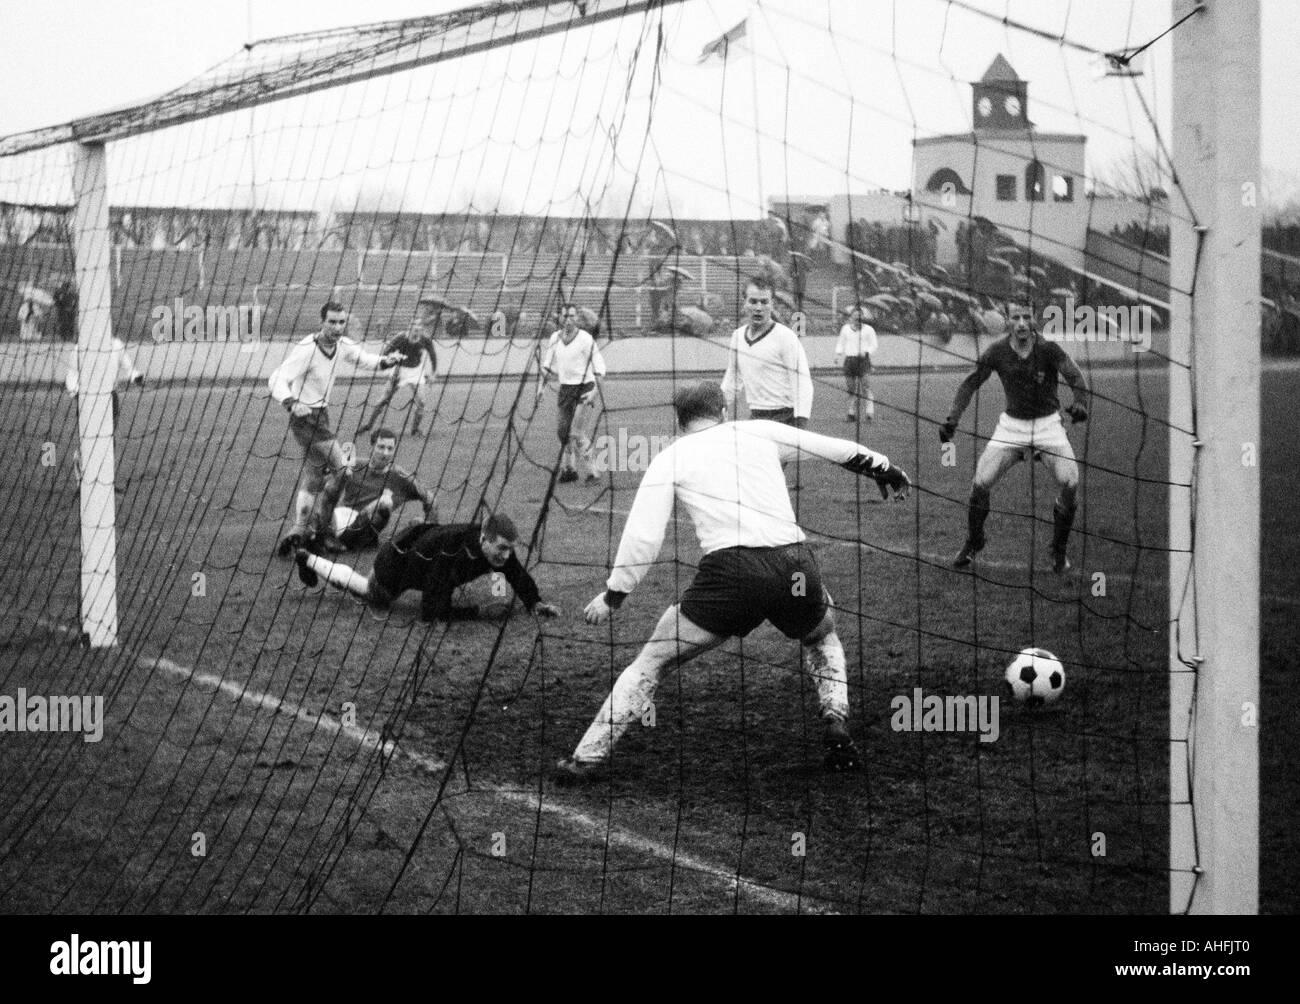 football, Regionalliga West, 1966/1967, Rot-Weiss Oberhausen versus VfL Bochum 4:4, Niederrhein Stadium in Oberhausen, scene of the match, the Oberhausen players (white tricot) f.l.t.r. Dieter Hentschel, Friedhelm Kobluhn, Albert Eichholz, Lothar Kobluhn - Stock Image